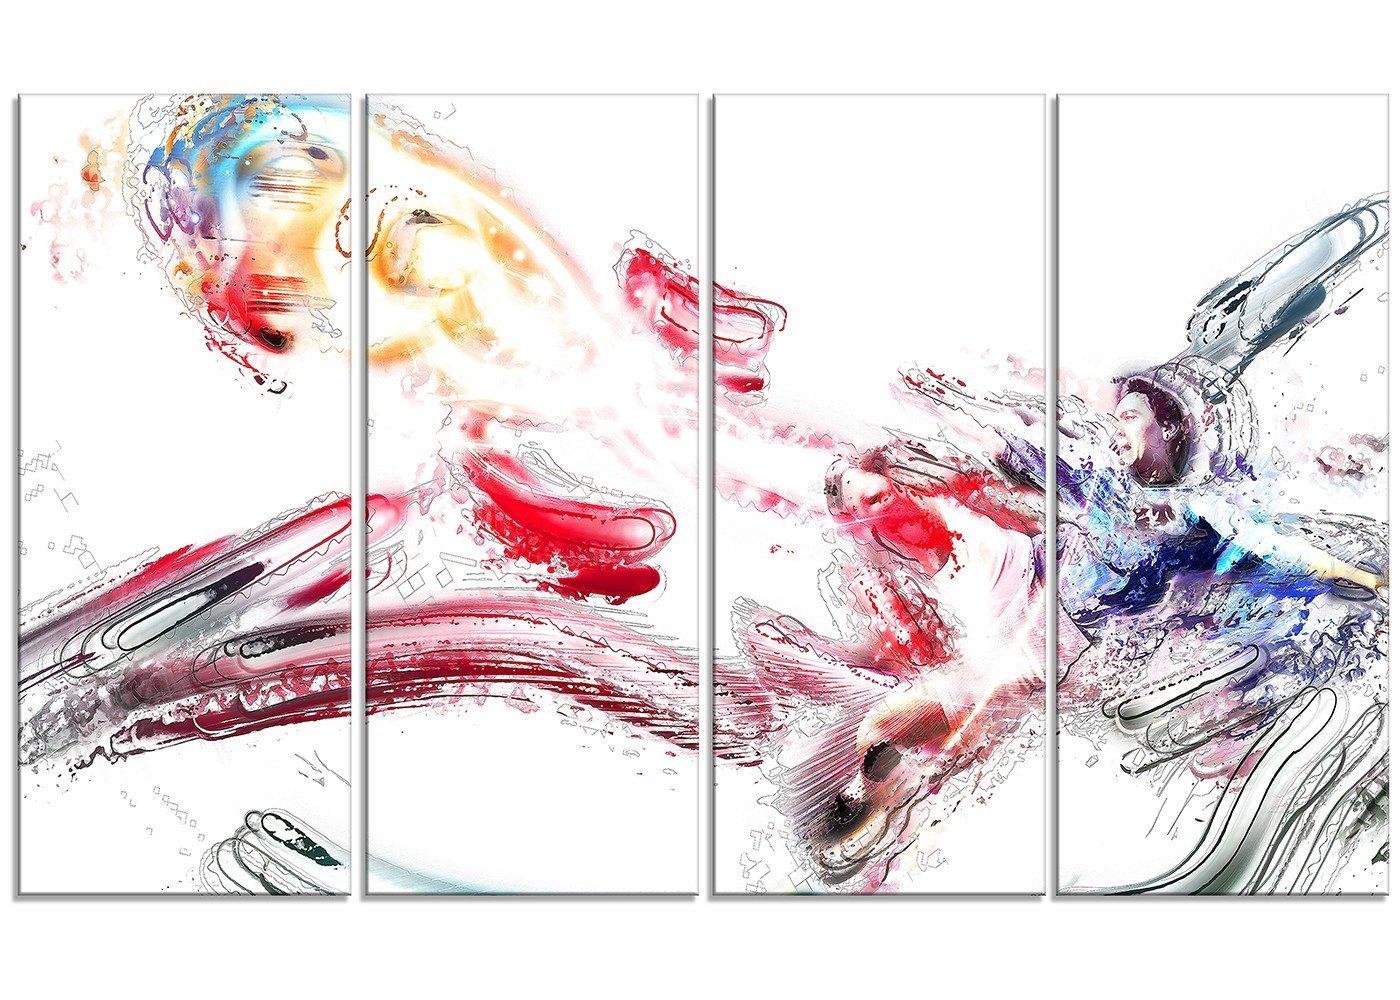 Large Sport Canvas Art 28 H/x/48 W/x/1 D 4P Designart PT2502-271 Soccer Booting The Ball